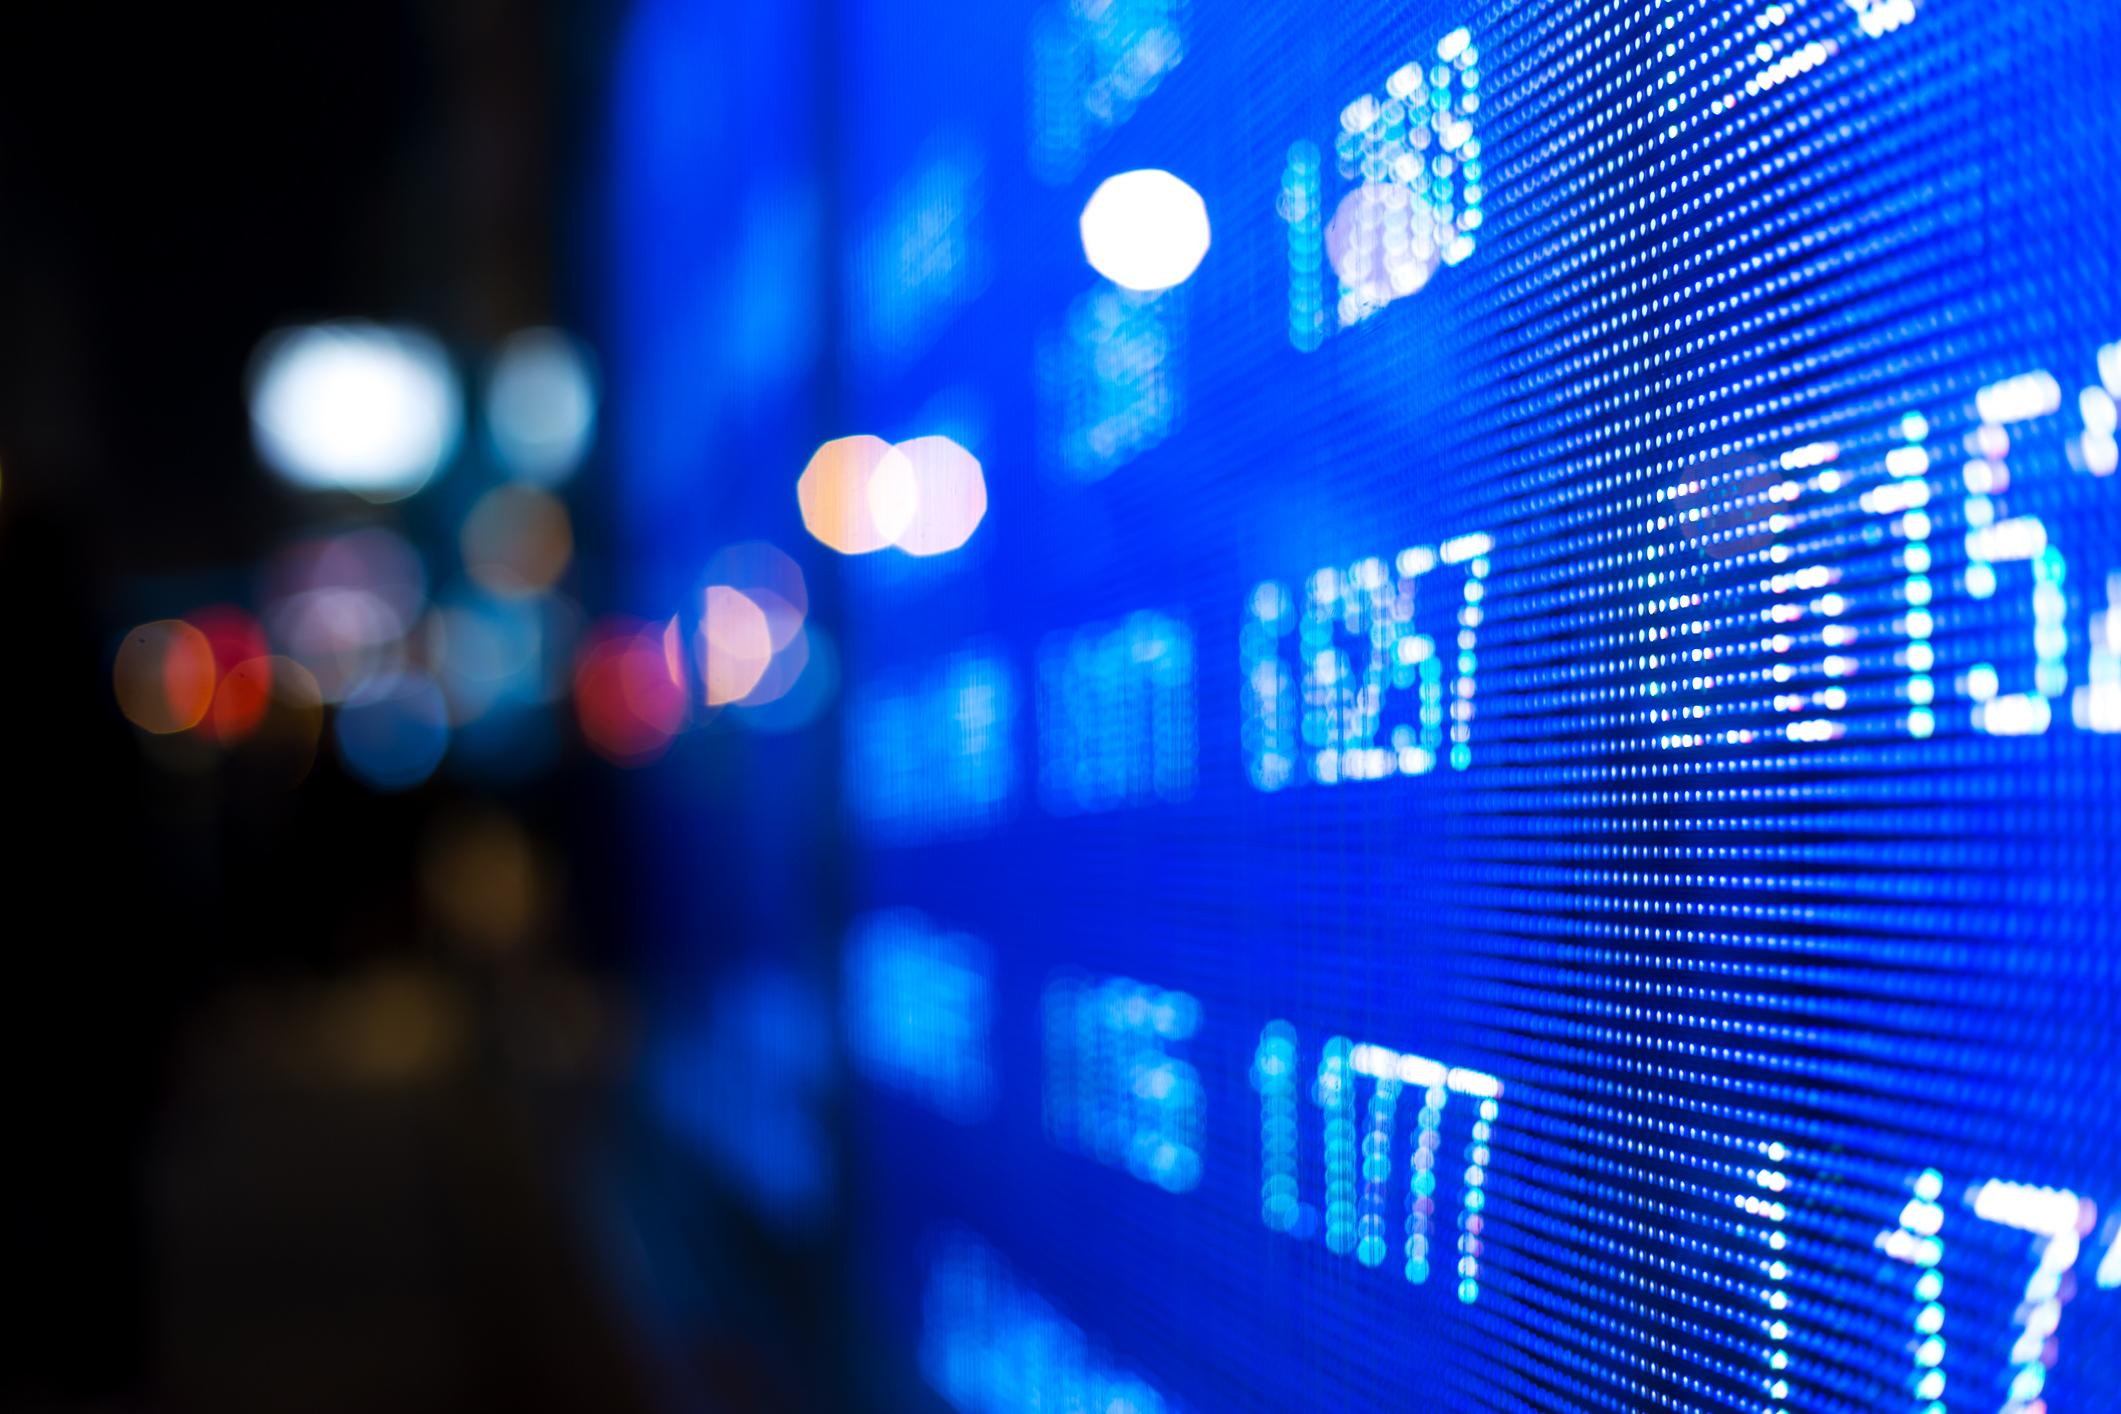 Stock market data on a digital screen.